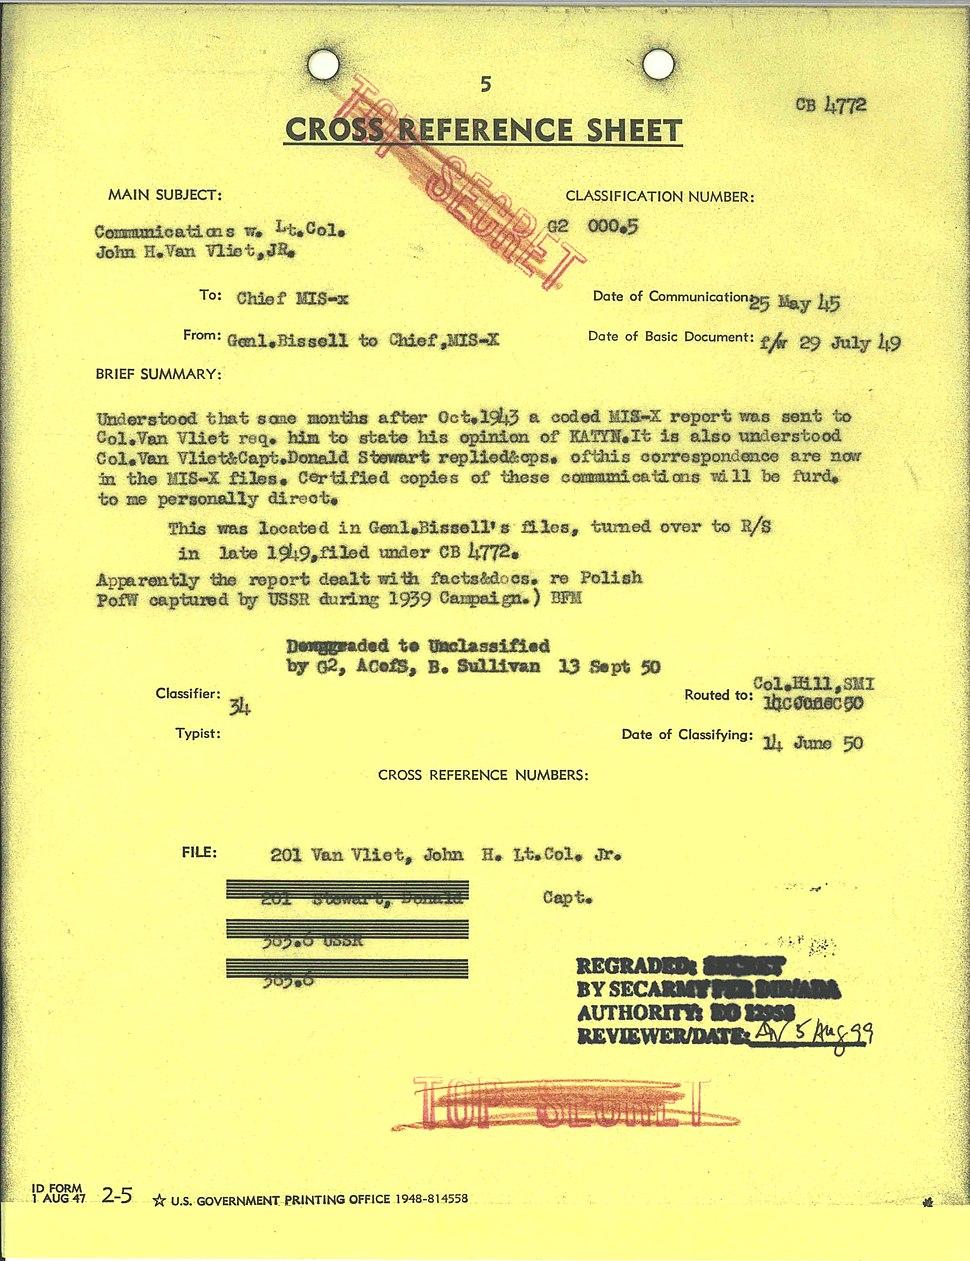 Transmittal - Communications with Lt. Col. John H. Van Vliet, Jr. - NARA - 6256897